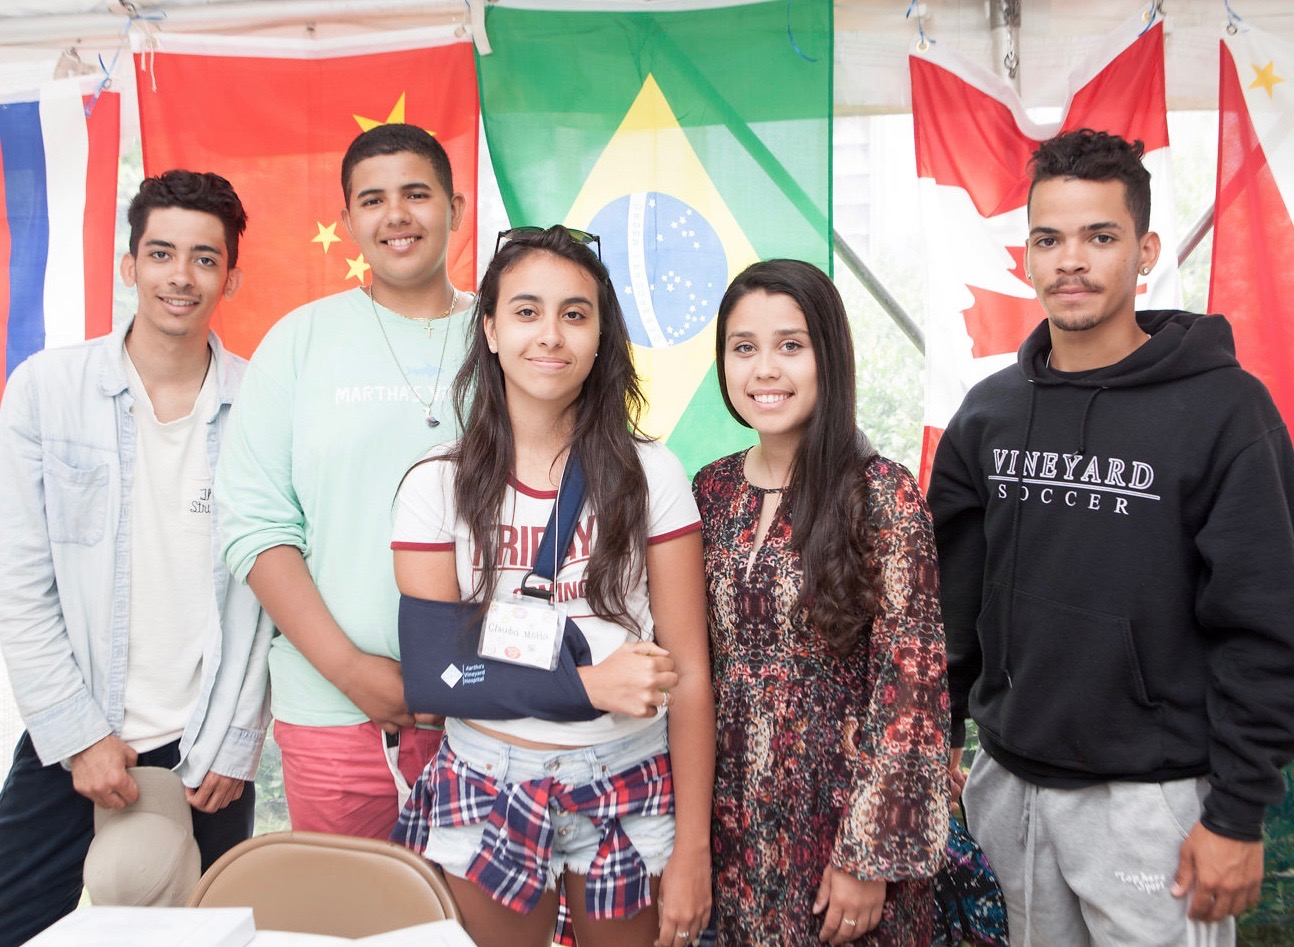 Brazilian youth